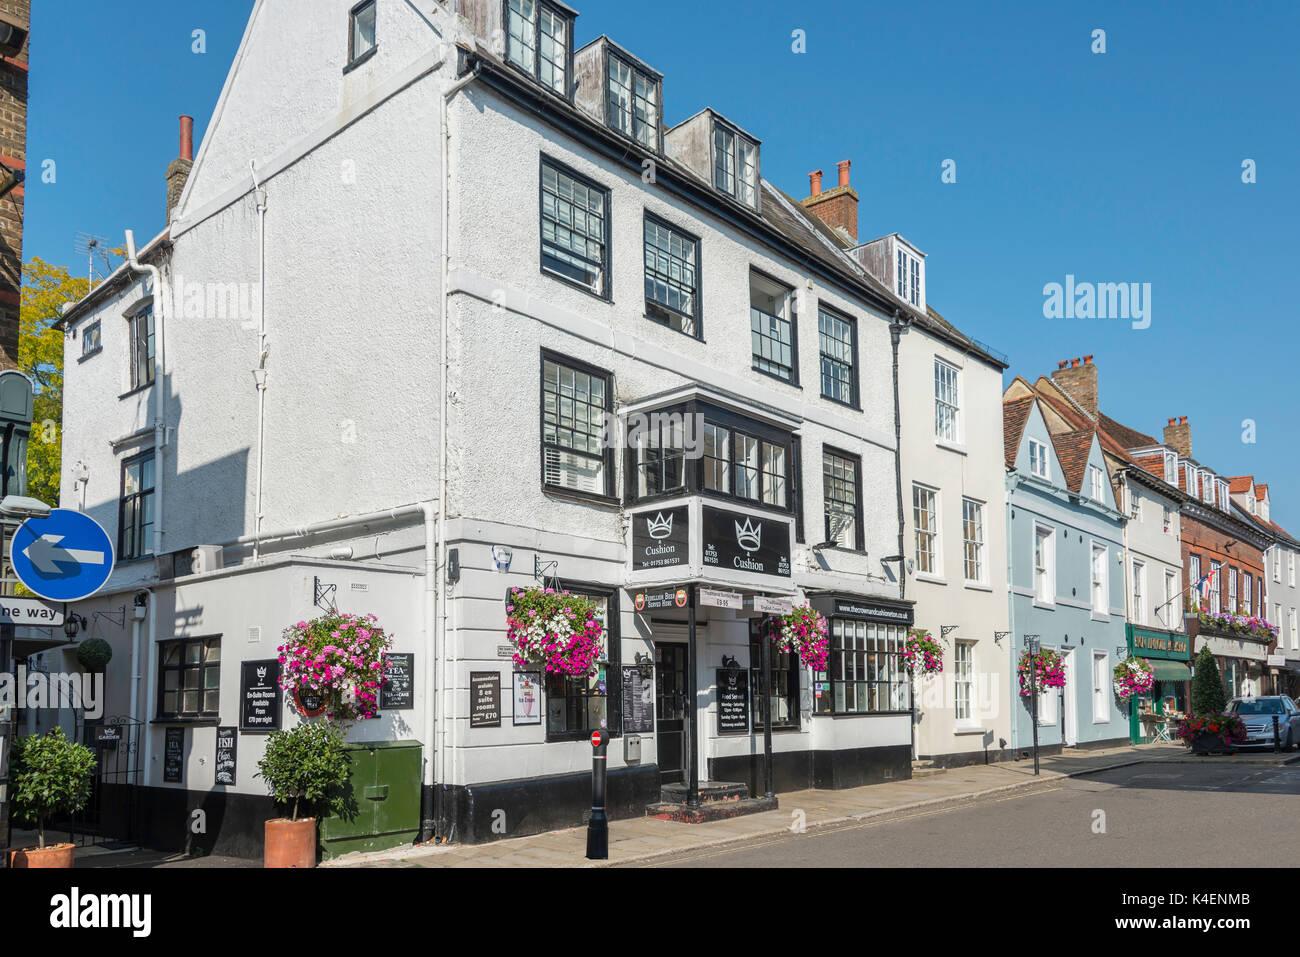 17th century The Crown and Cushion Inn, High Street, Eton, Berkshire, England, United Kingdom - Stock Image